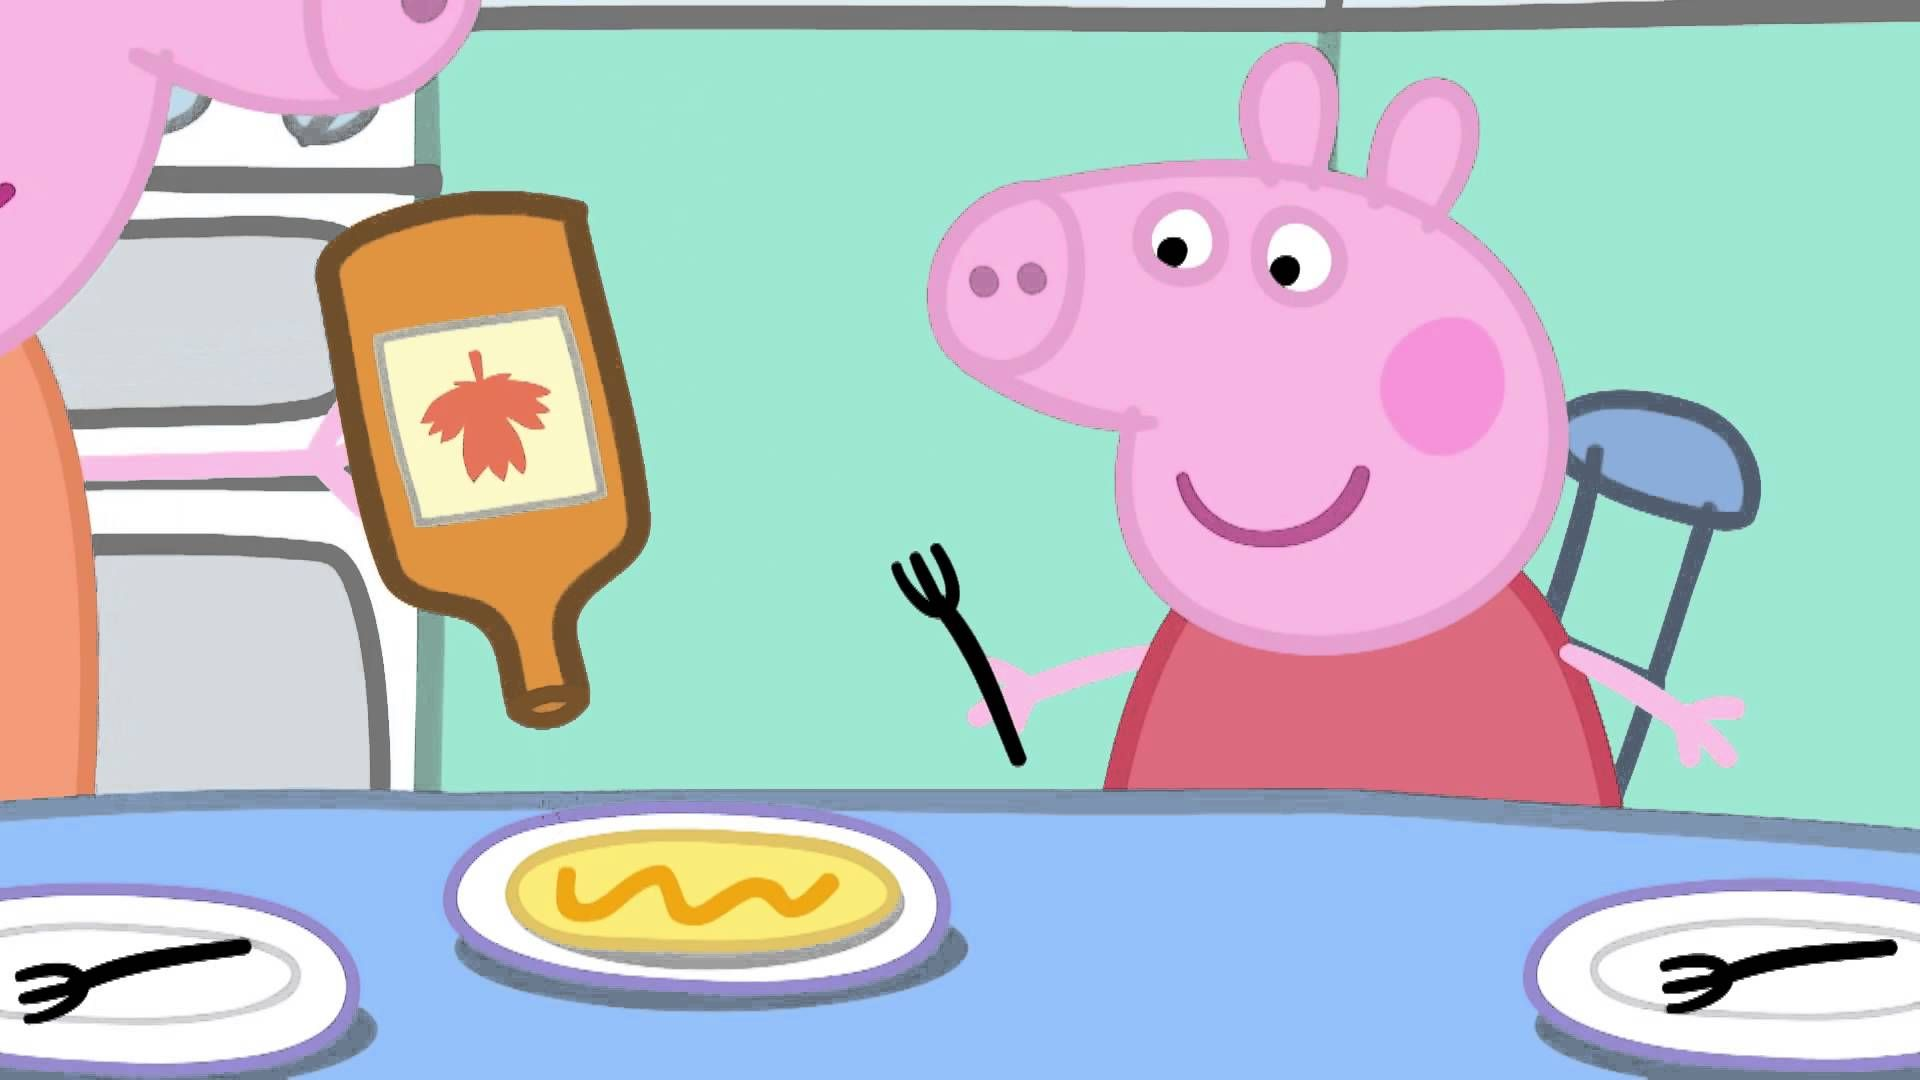 Peppa Pig: Pancakes. Cartoons for Kids/Children